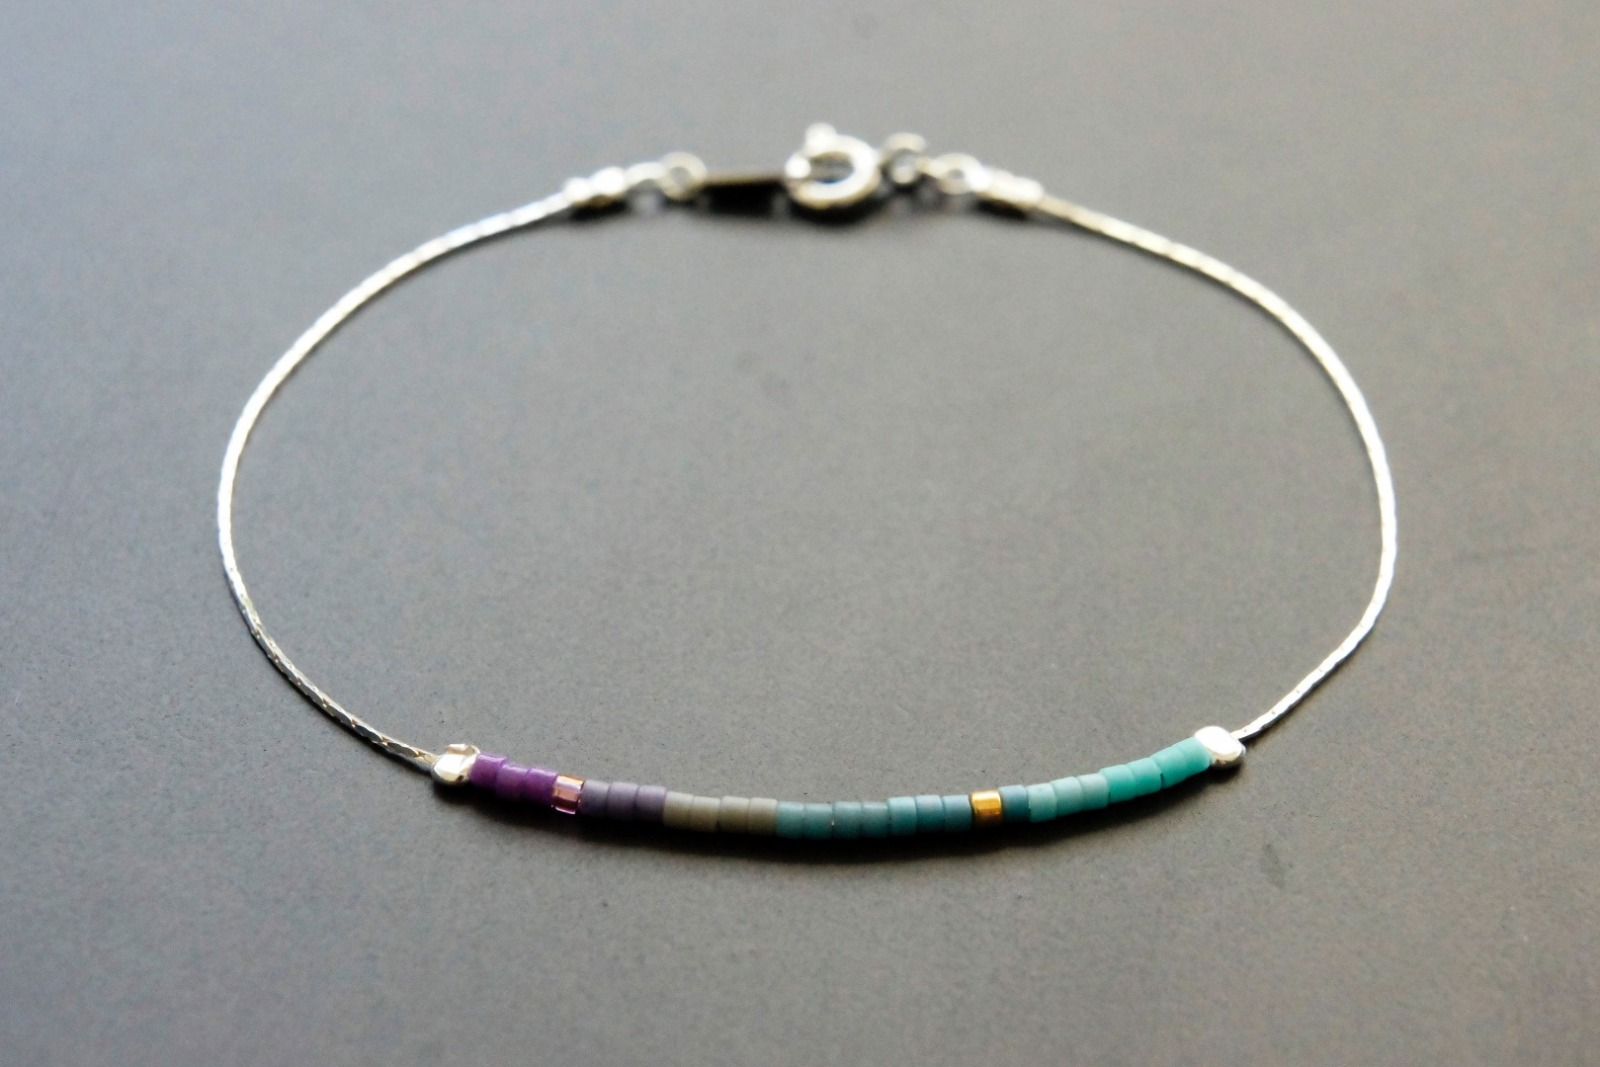 Filigranes Armband 925 Silber Verlauf lila-türkis - 1